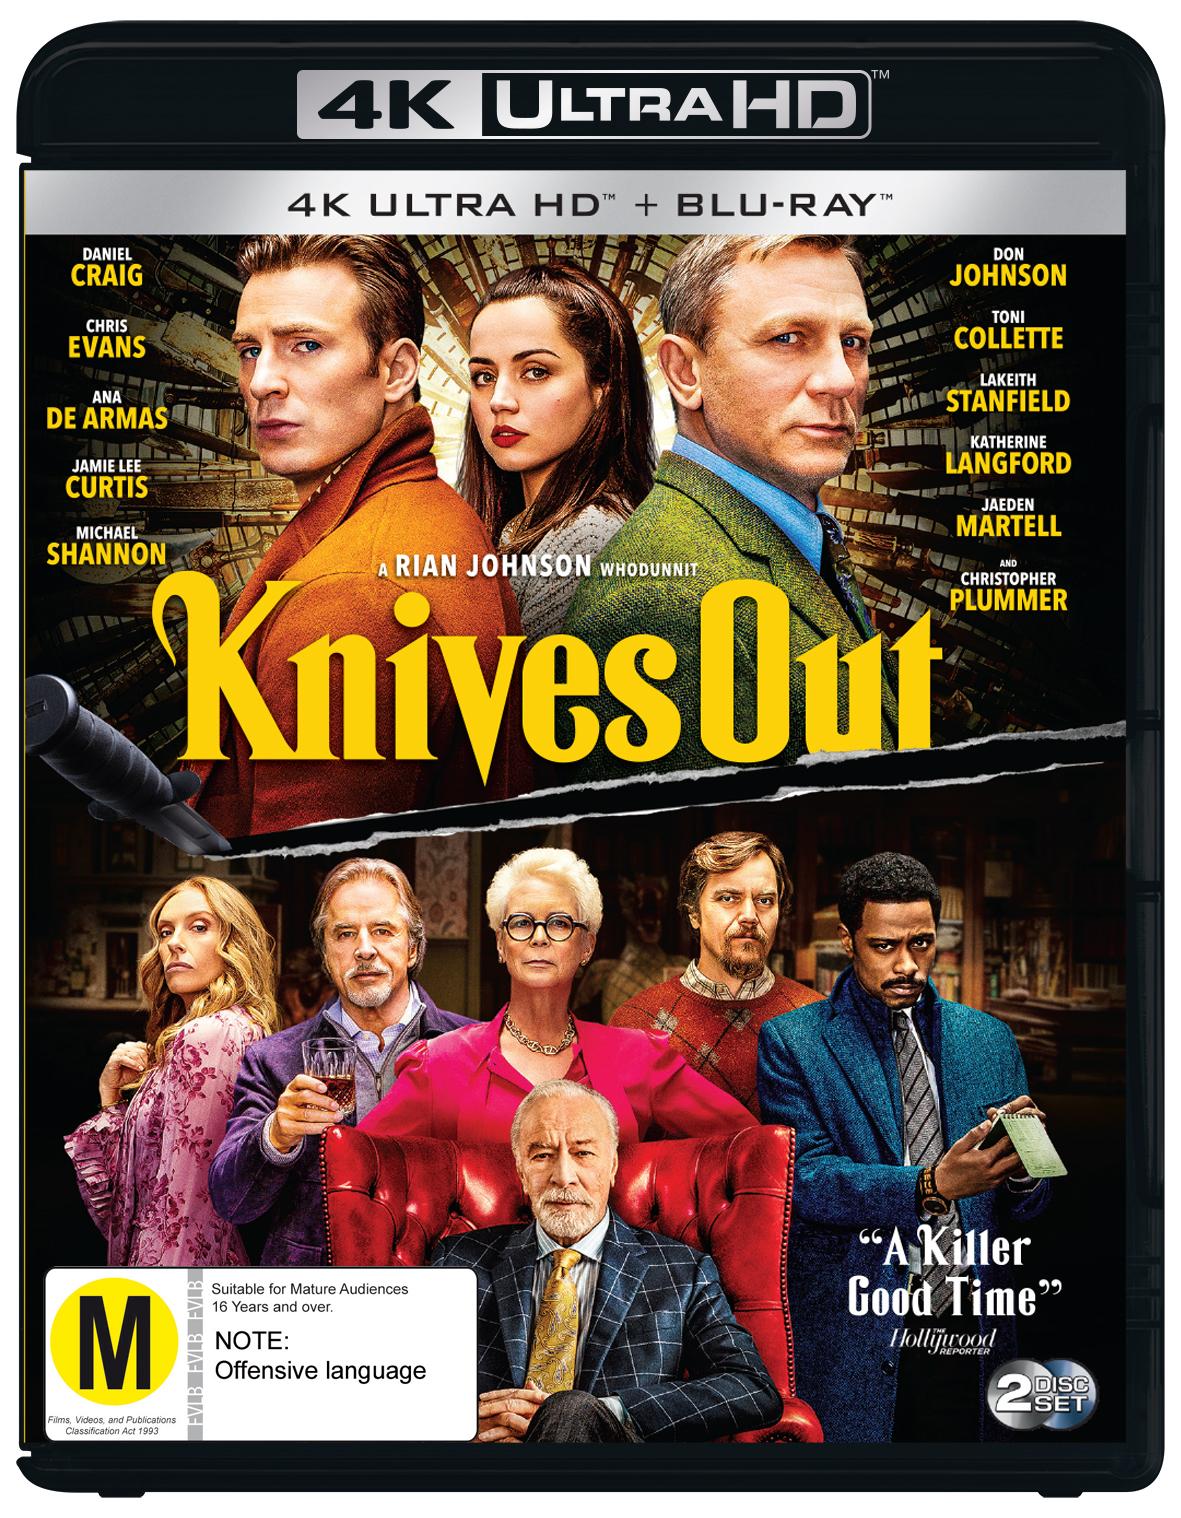 Knives Out (4K UHD + Blu-ray) on UHD Blu-ray image